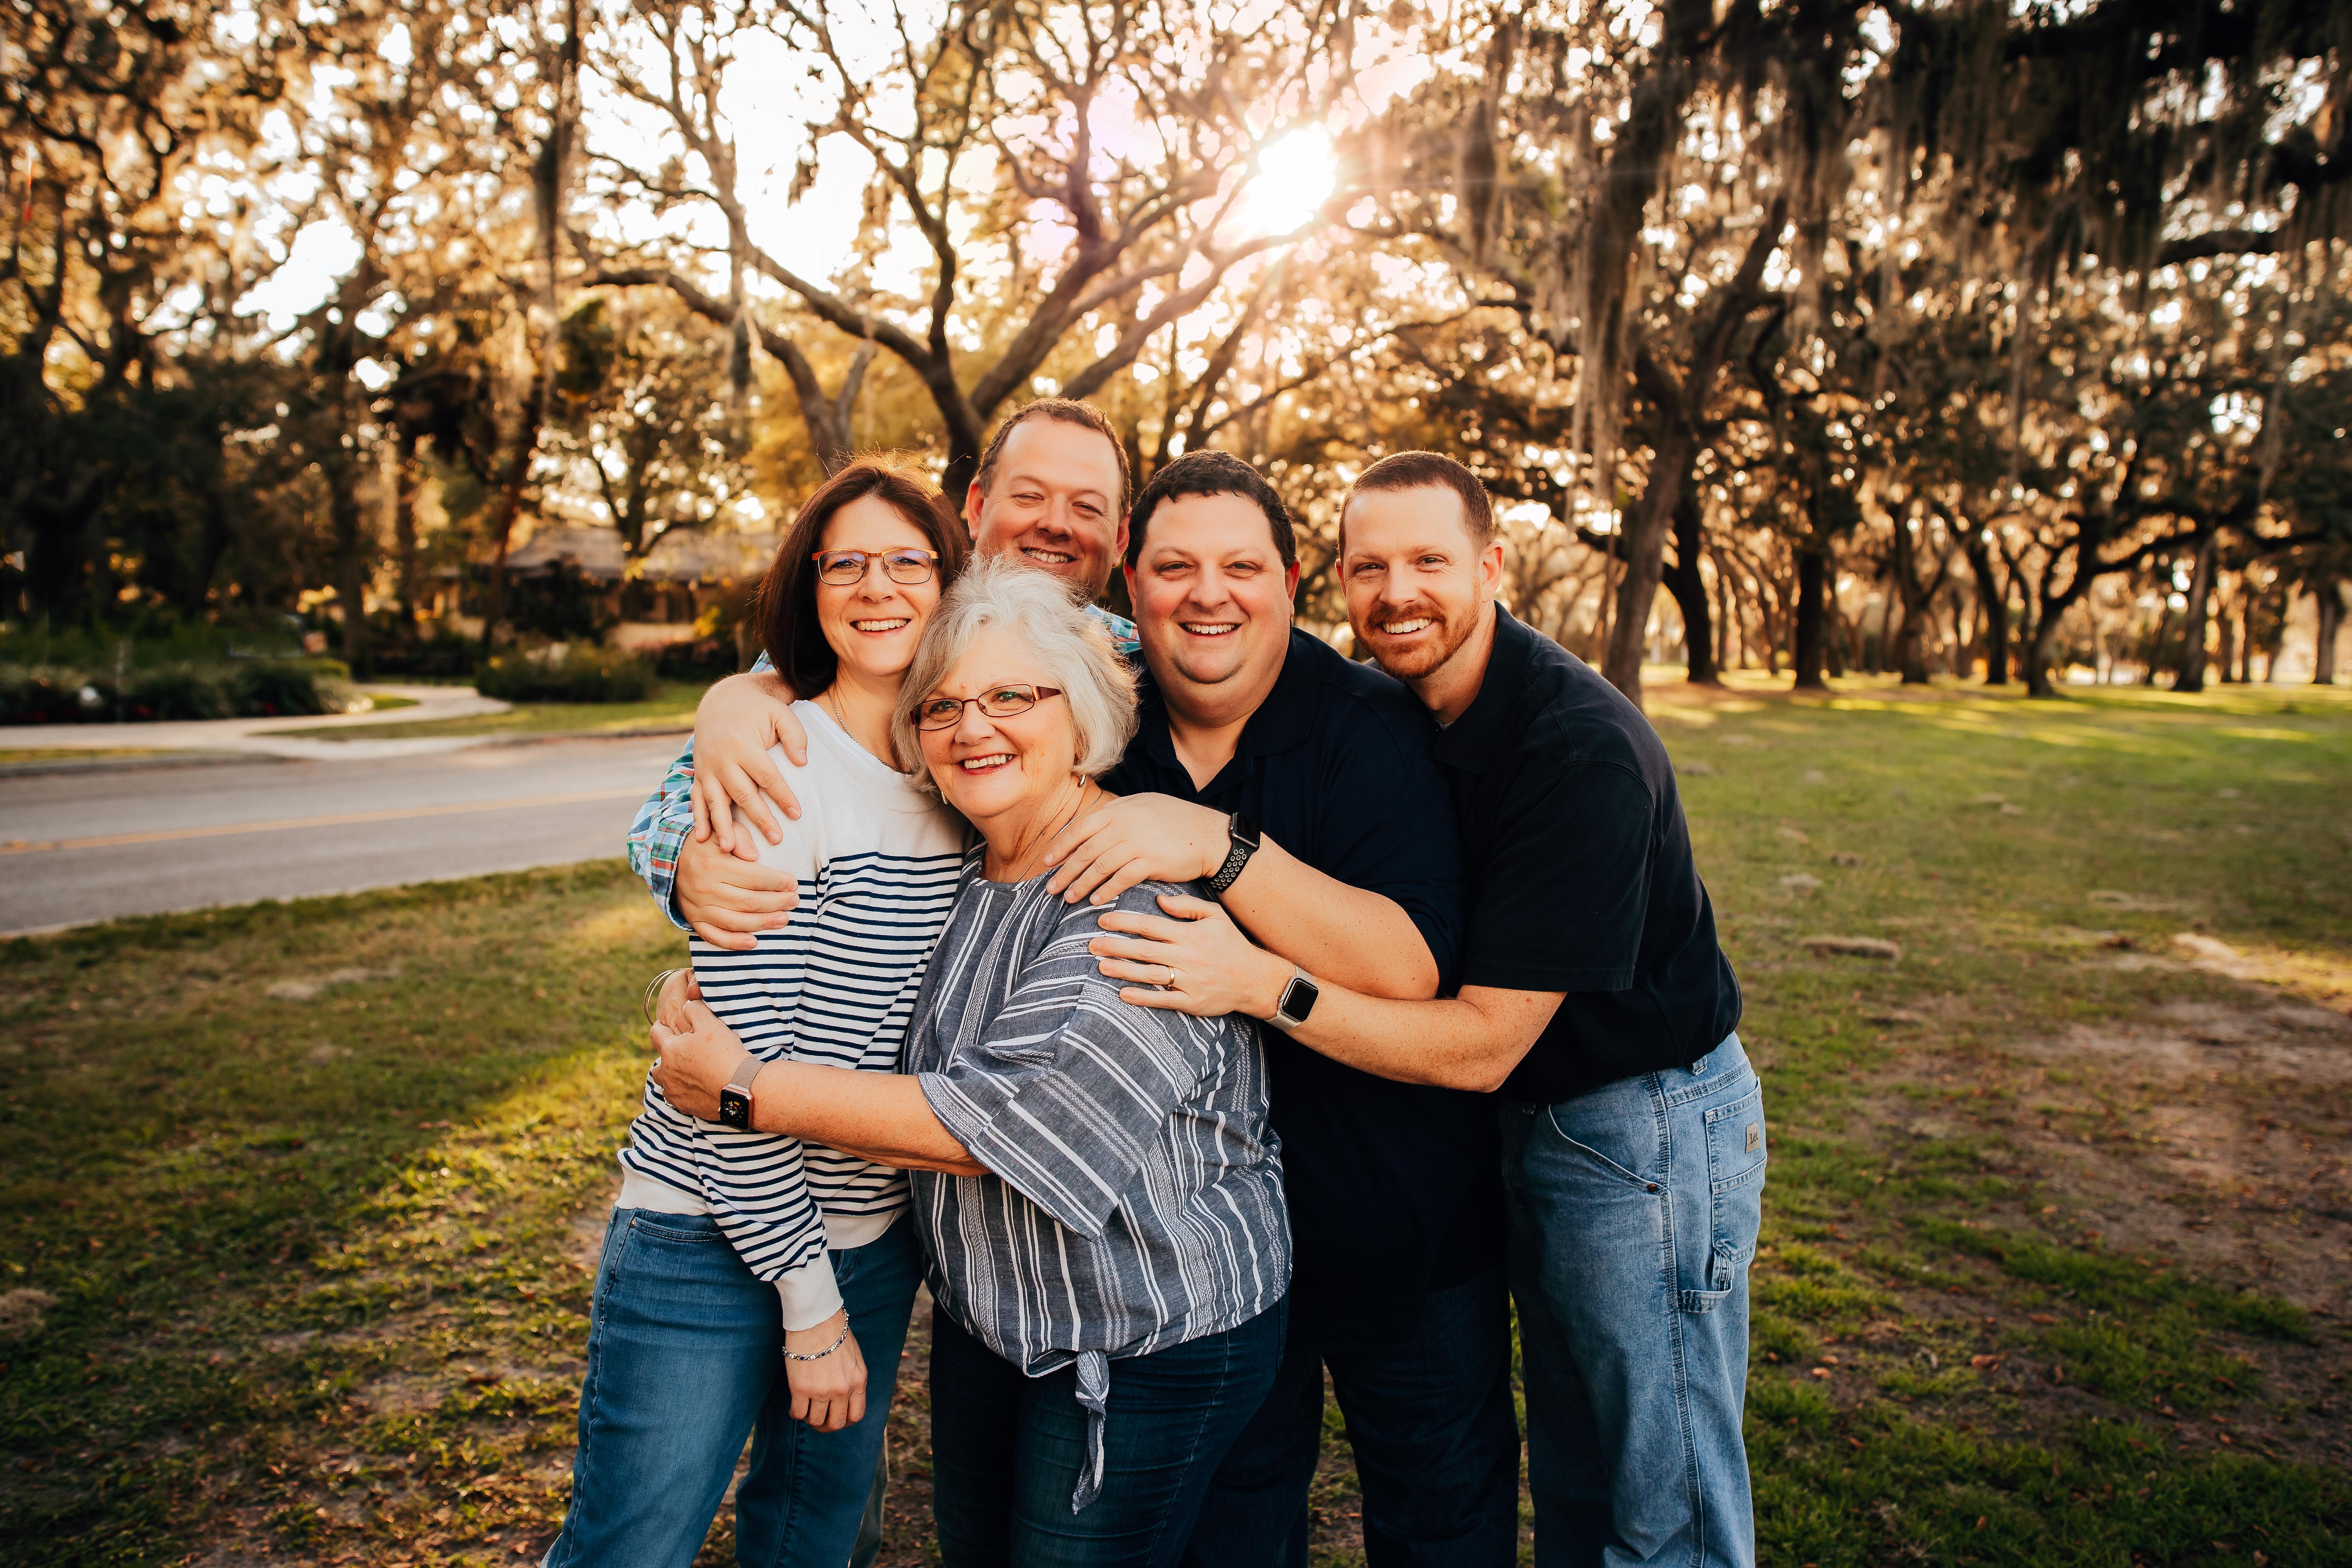 south tampa family photos